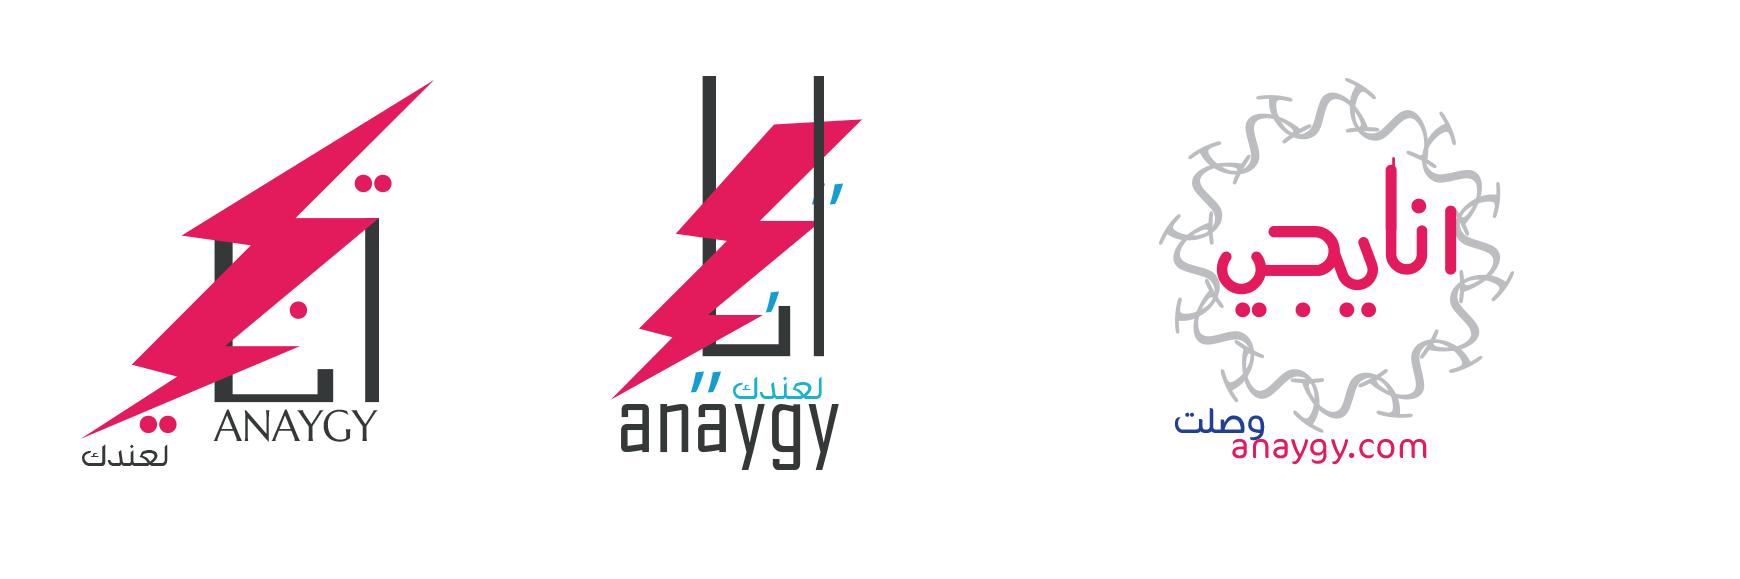 anaygy logo design by momenarts